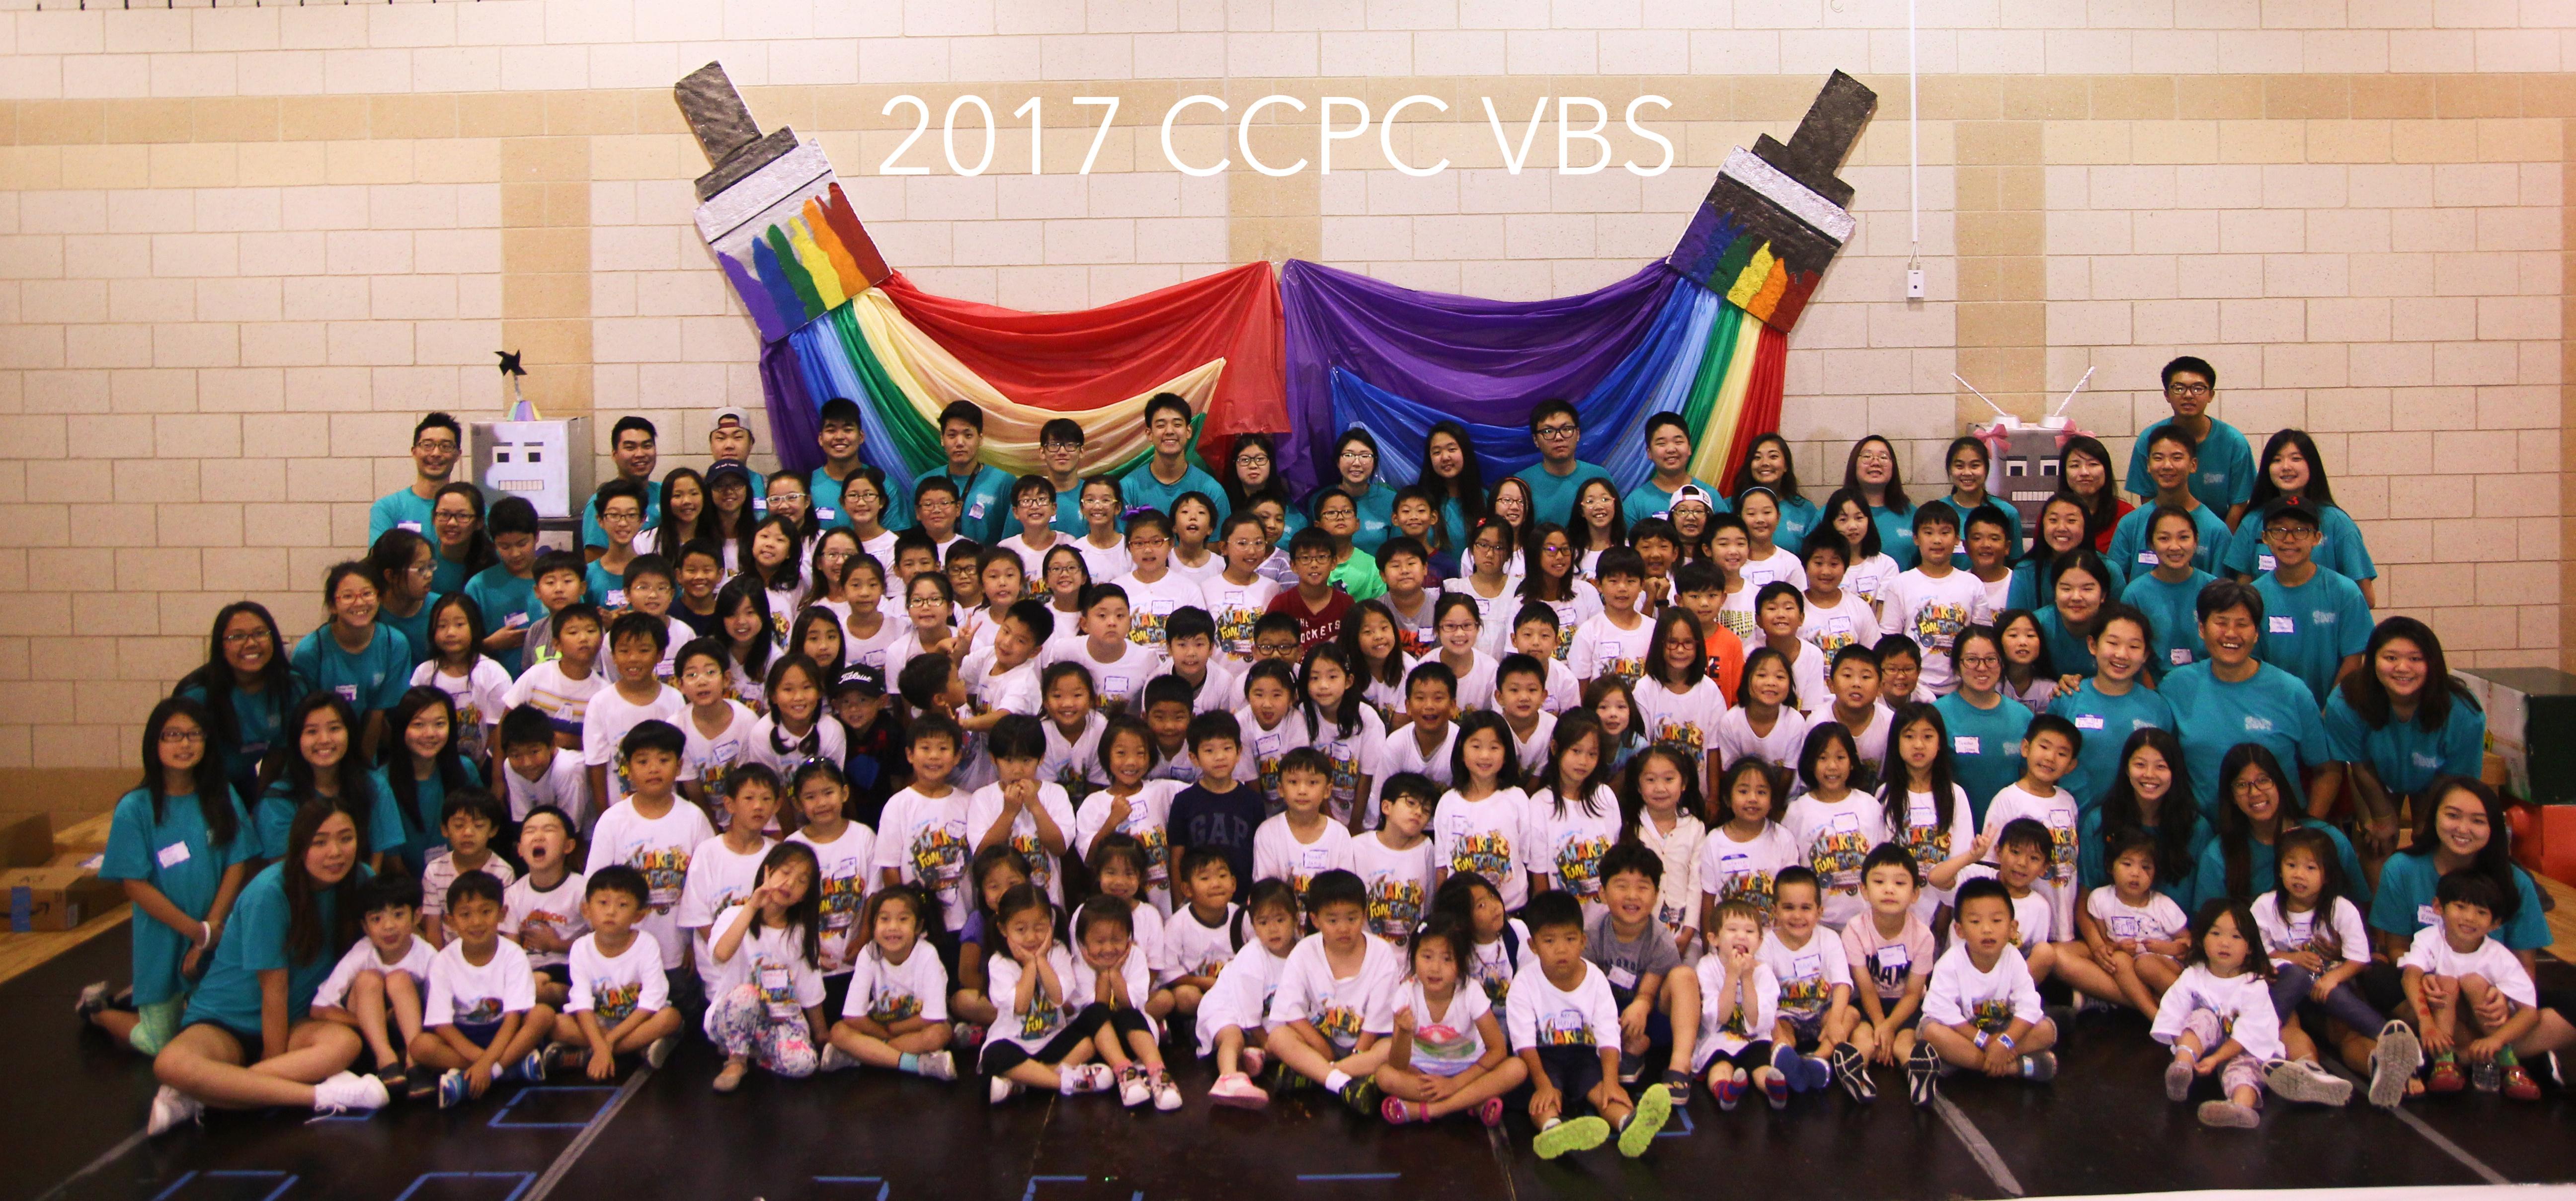 2017 CCPC VBS.jpg